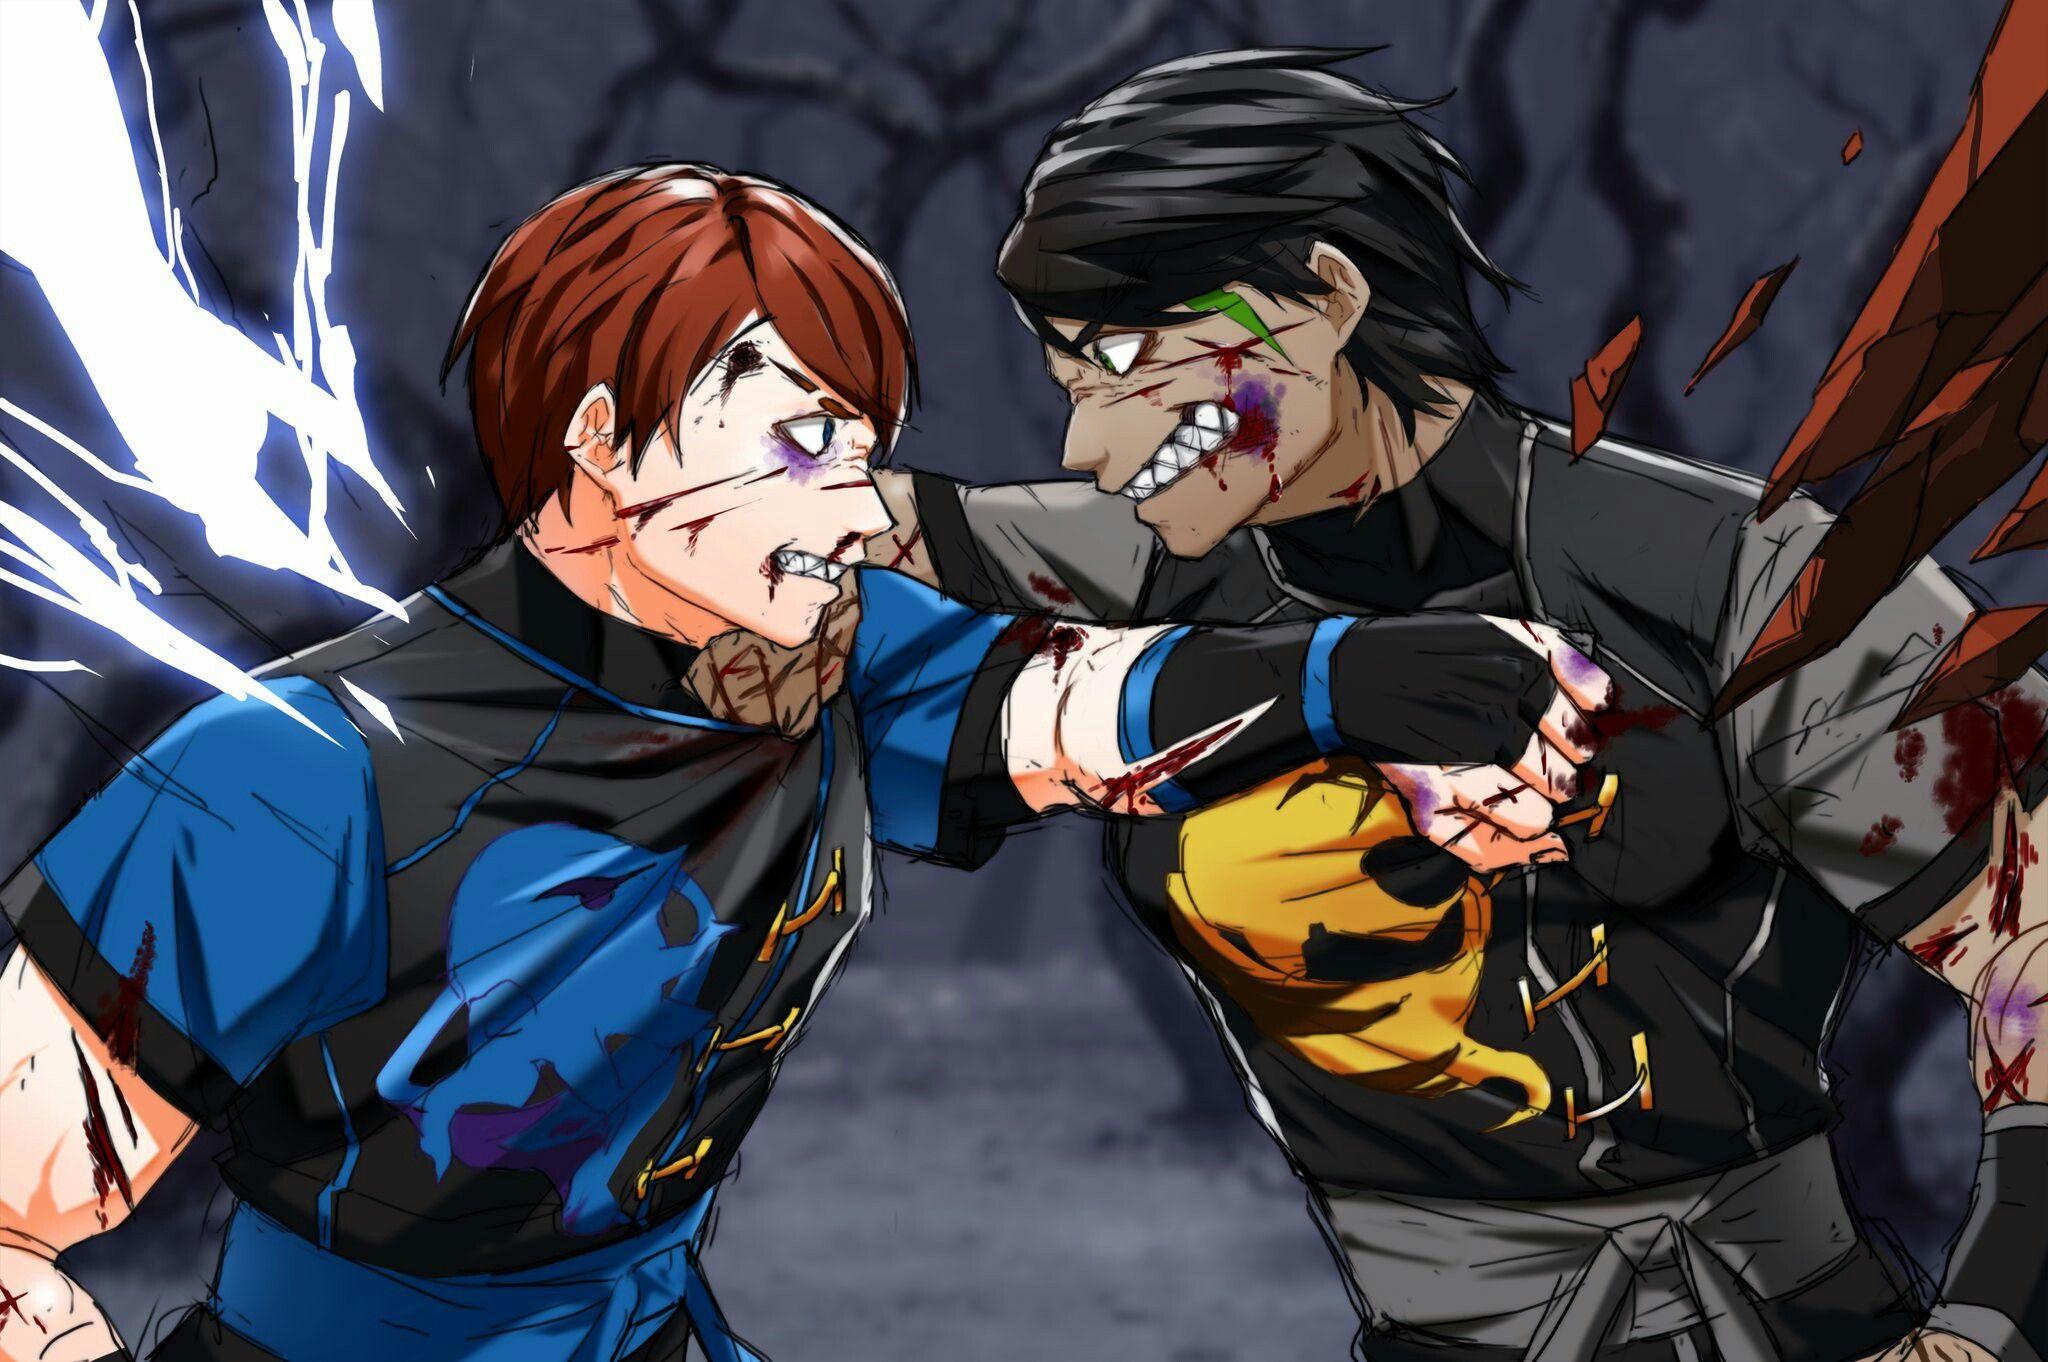 Ninjago dessin anime - Ninjago dessin anime ...